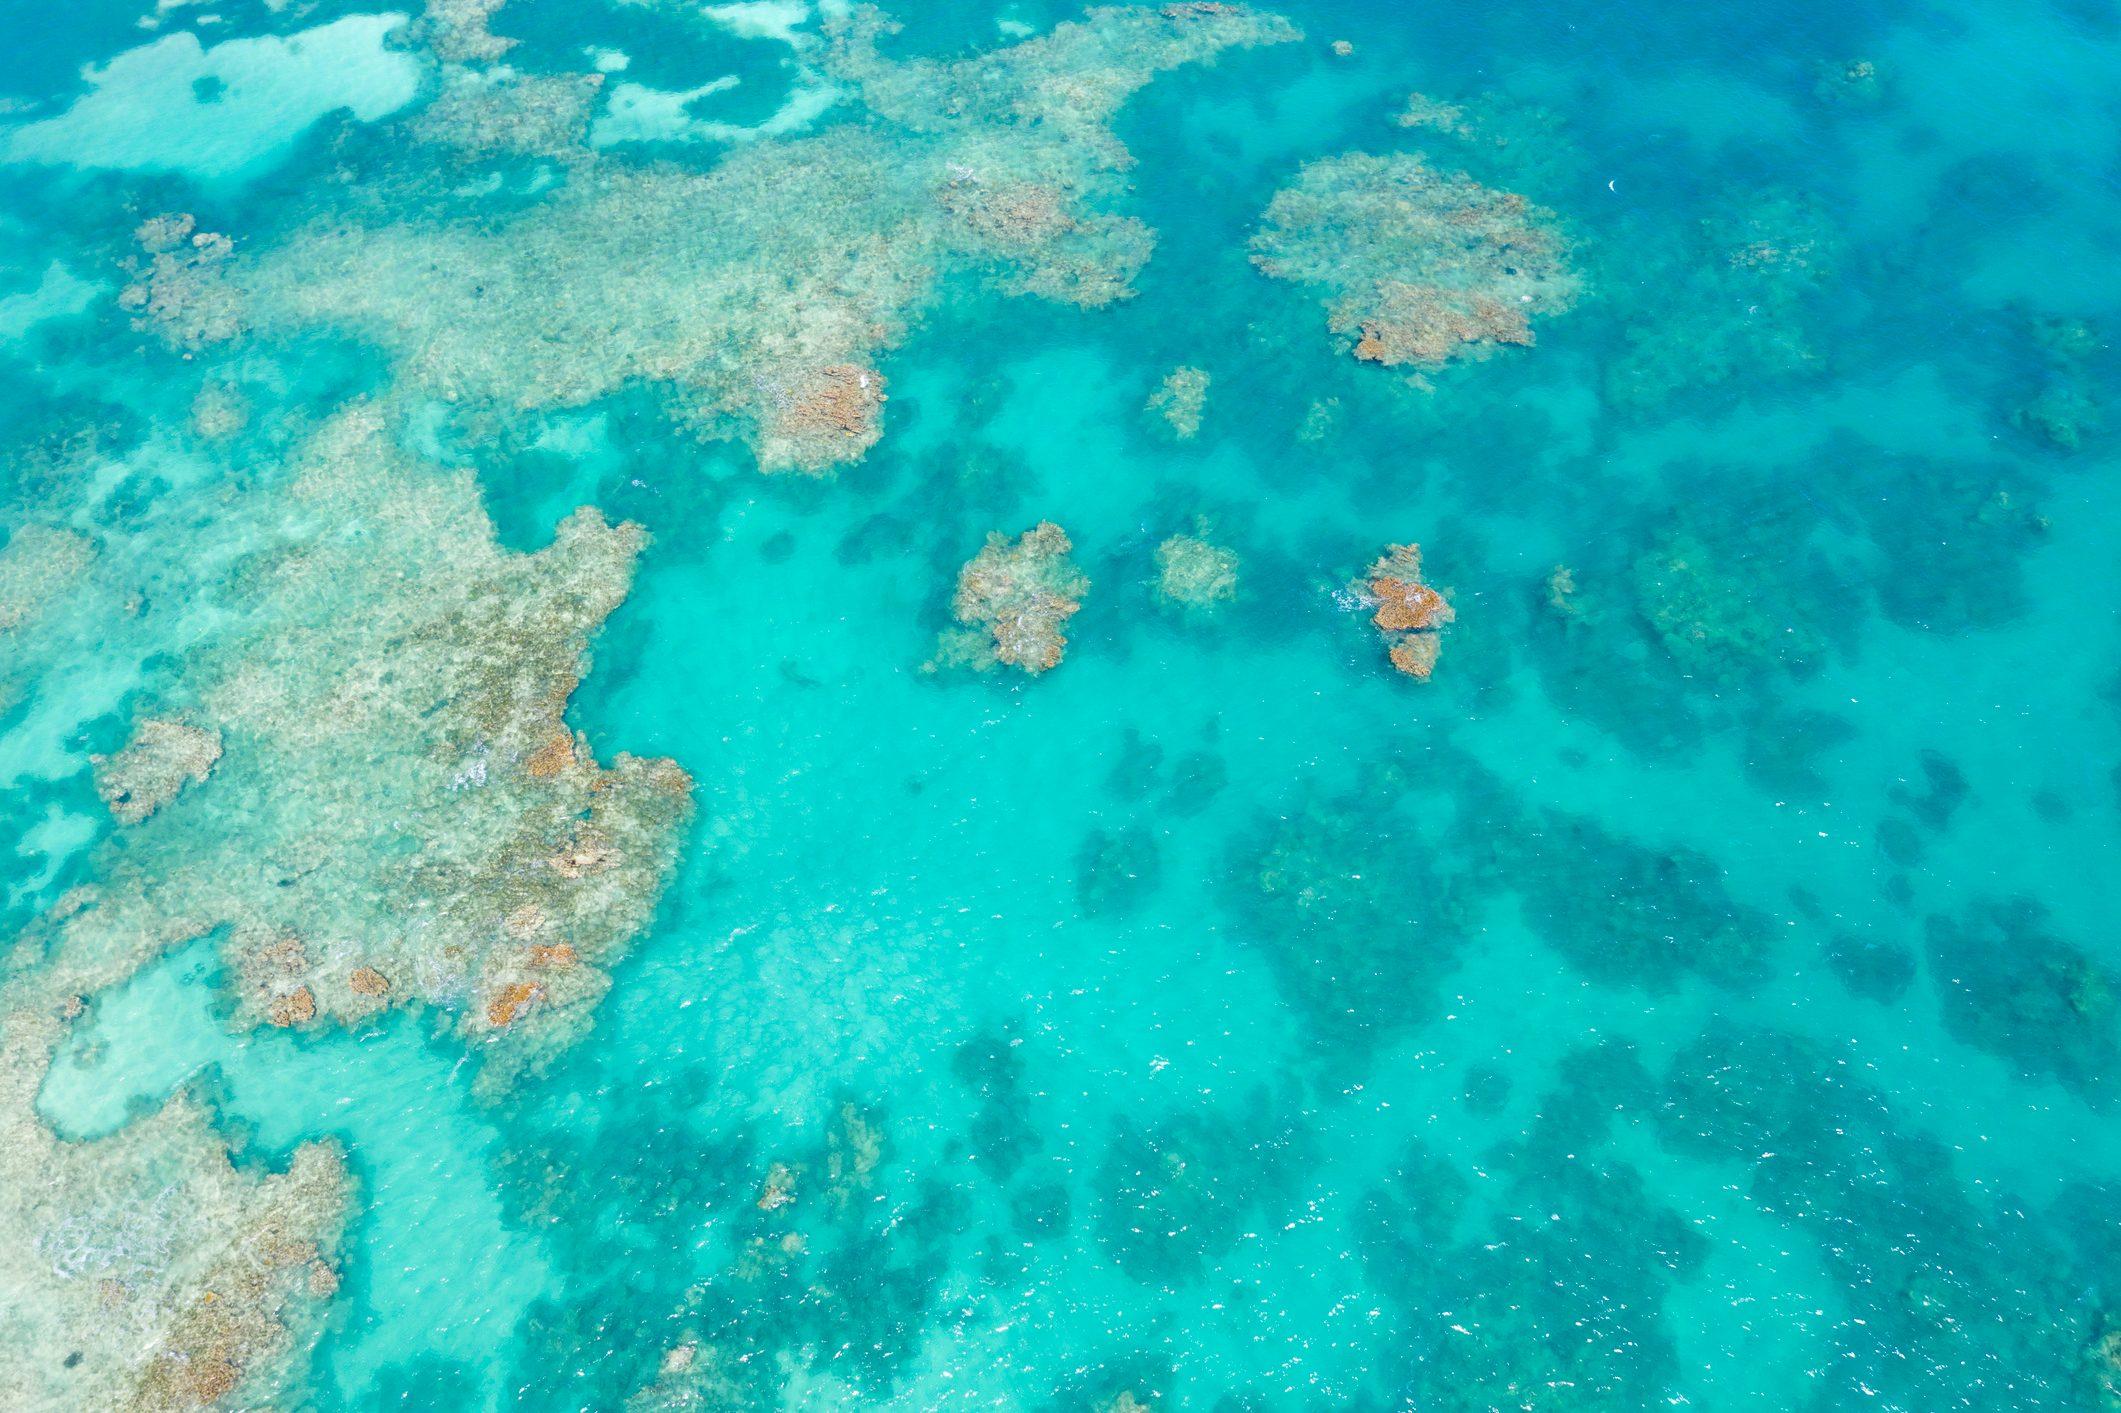 Aerial view of coral reef, Caribbean Sea, Antilles